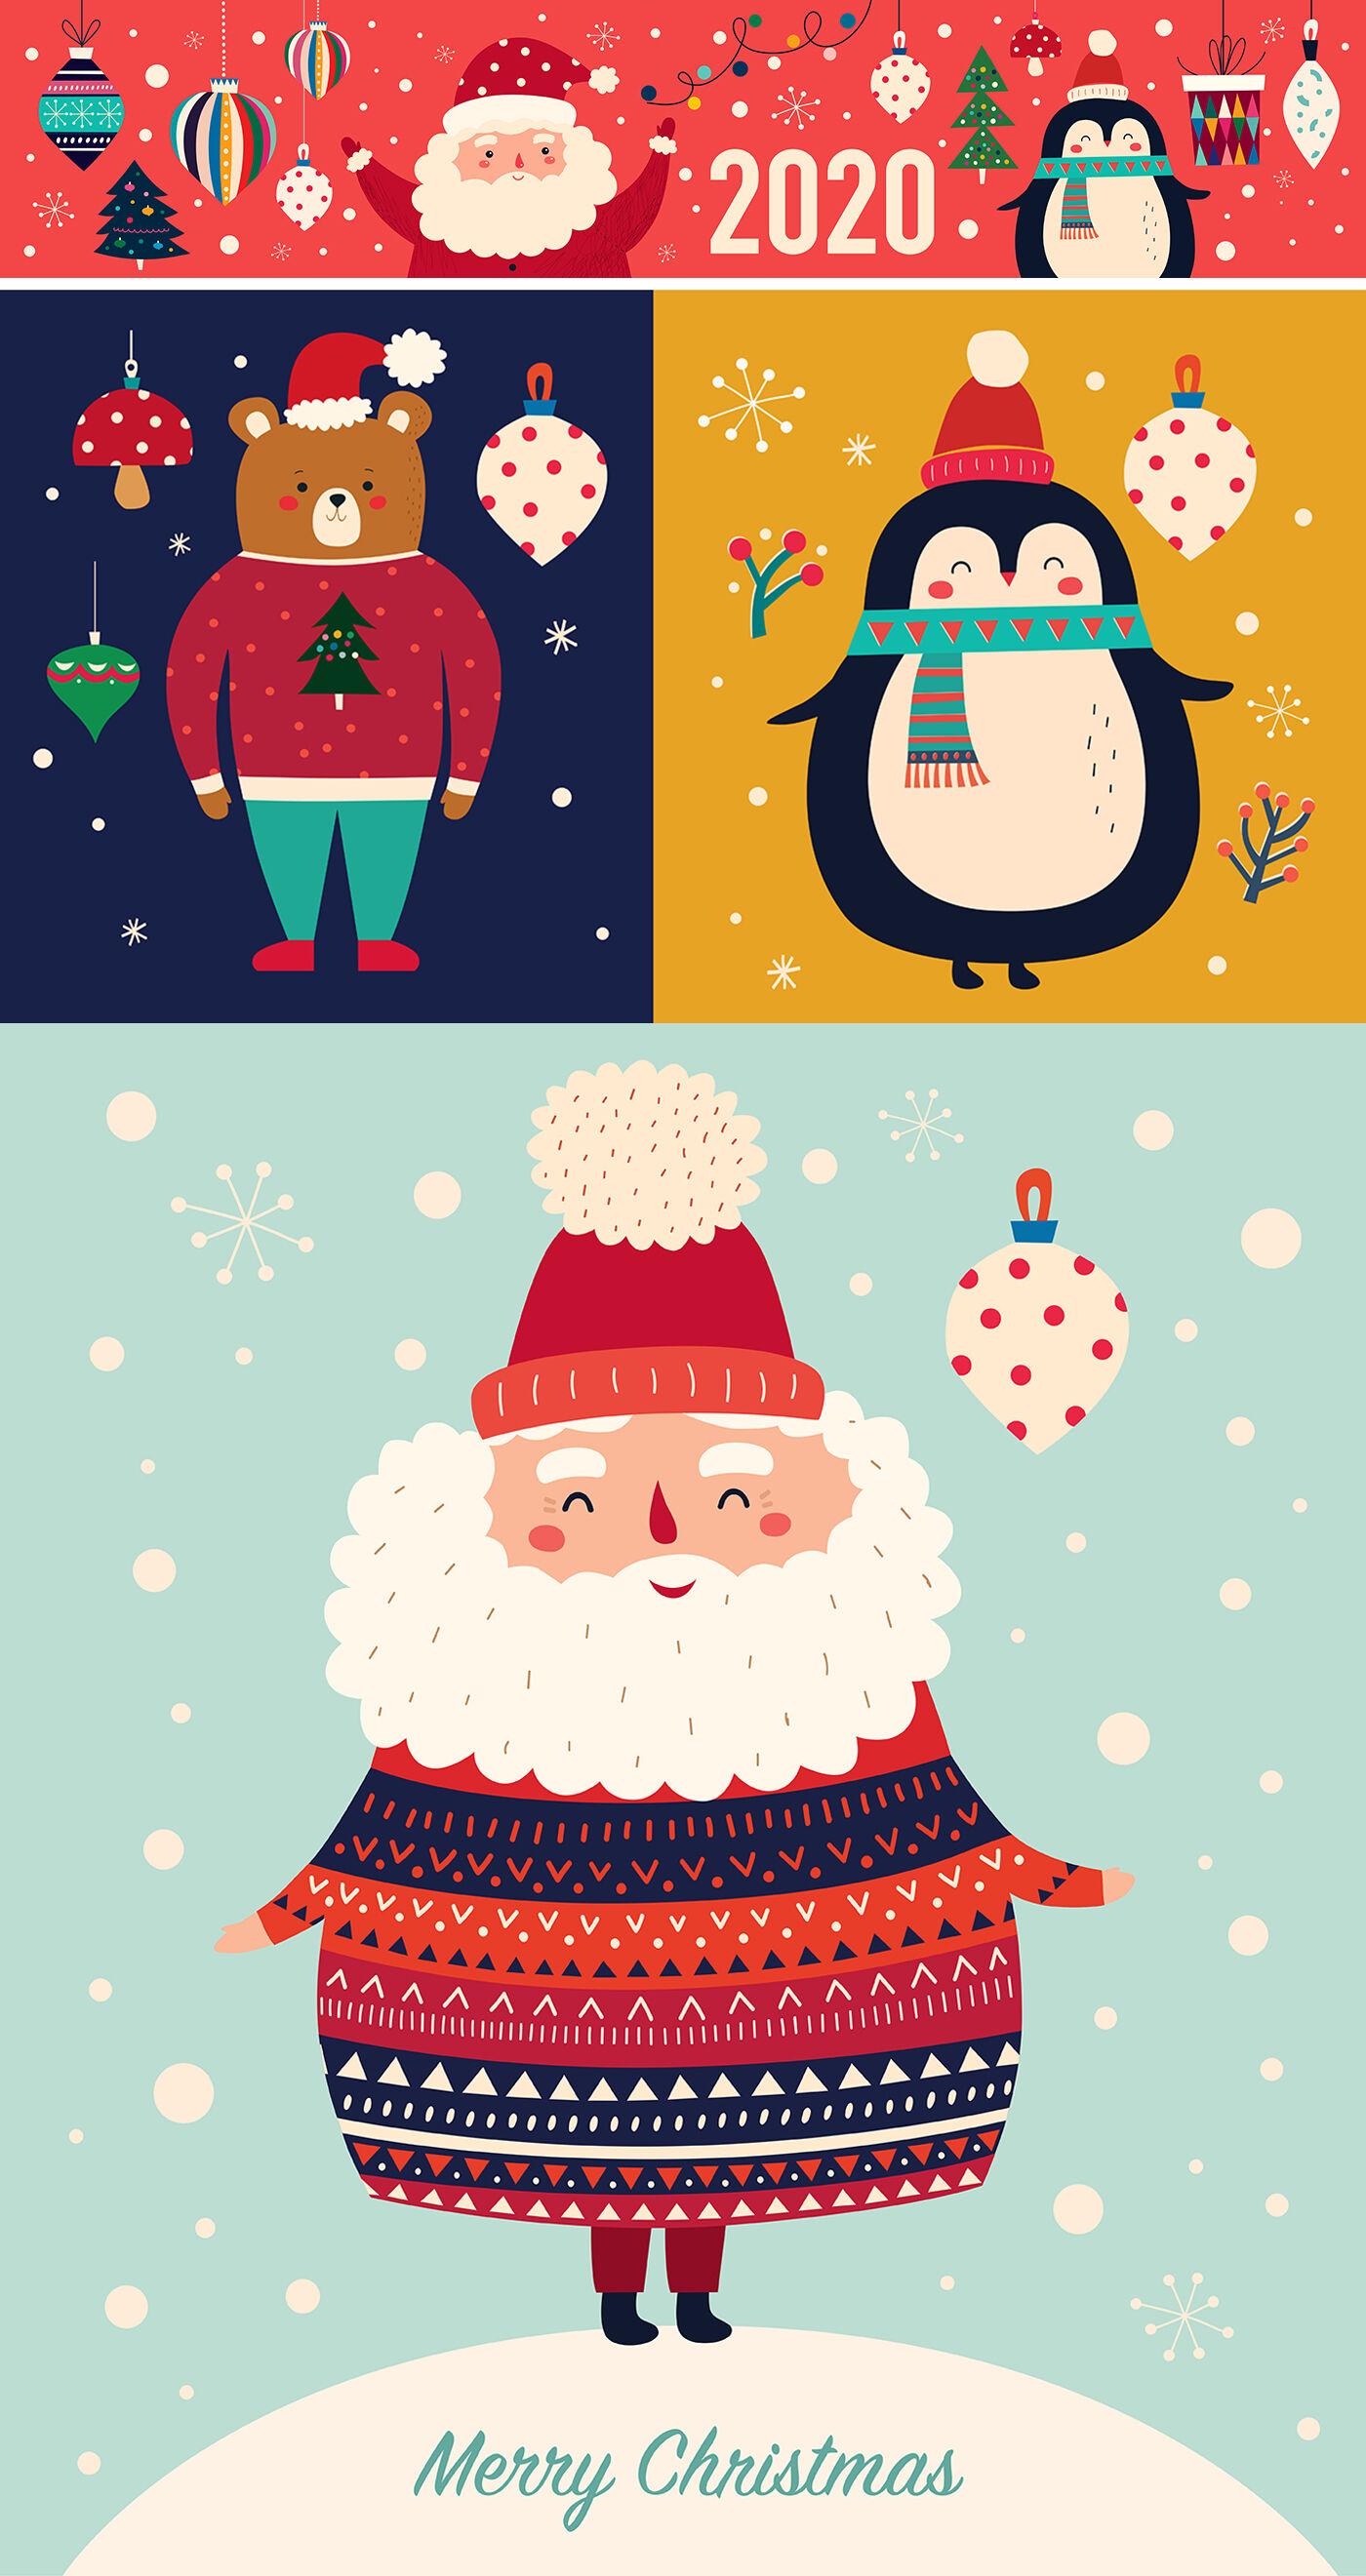 Santa Claus And Friends By Molesko Studio Thehungryjpeg Com